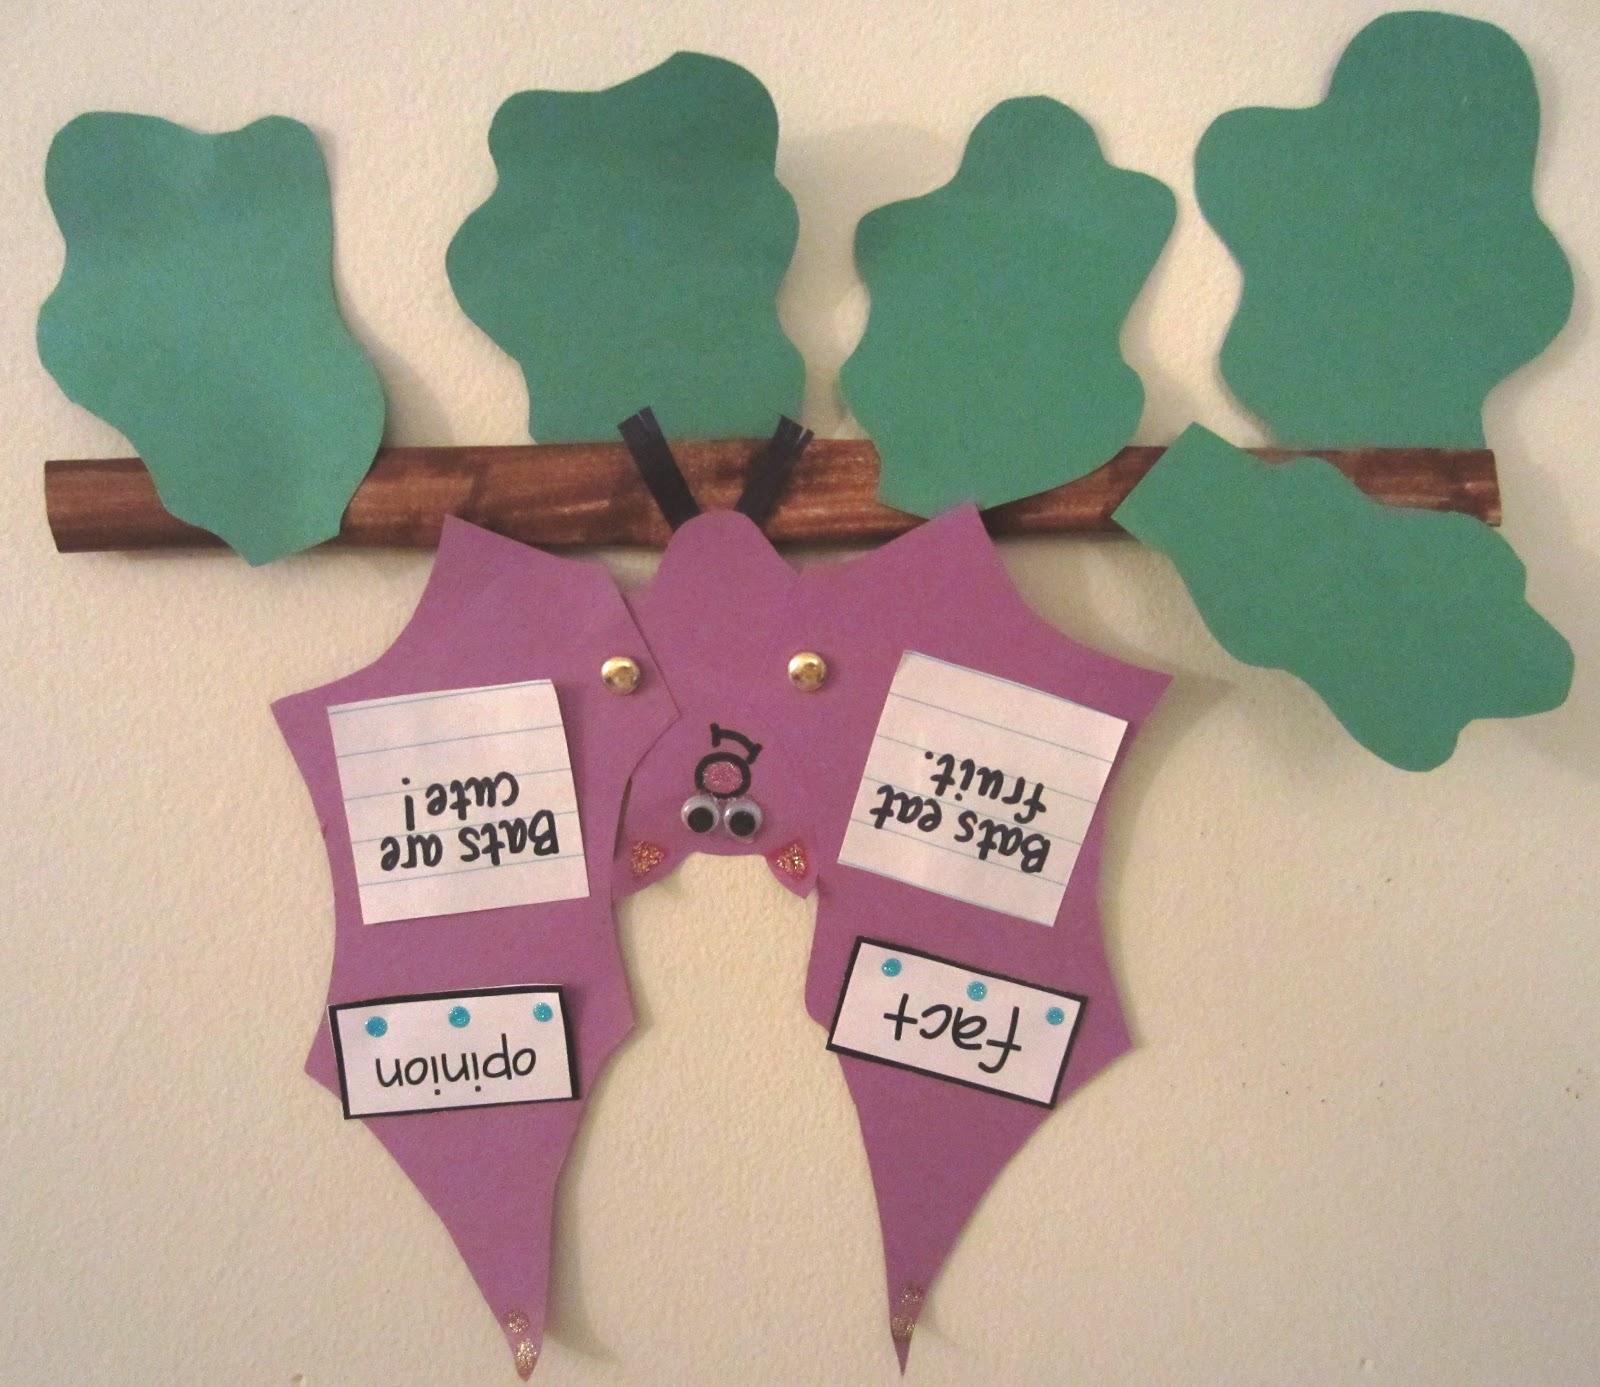 Collaboration Cuties Halloween Fun With Bats And Stellaluna